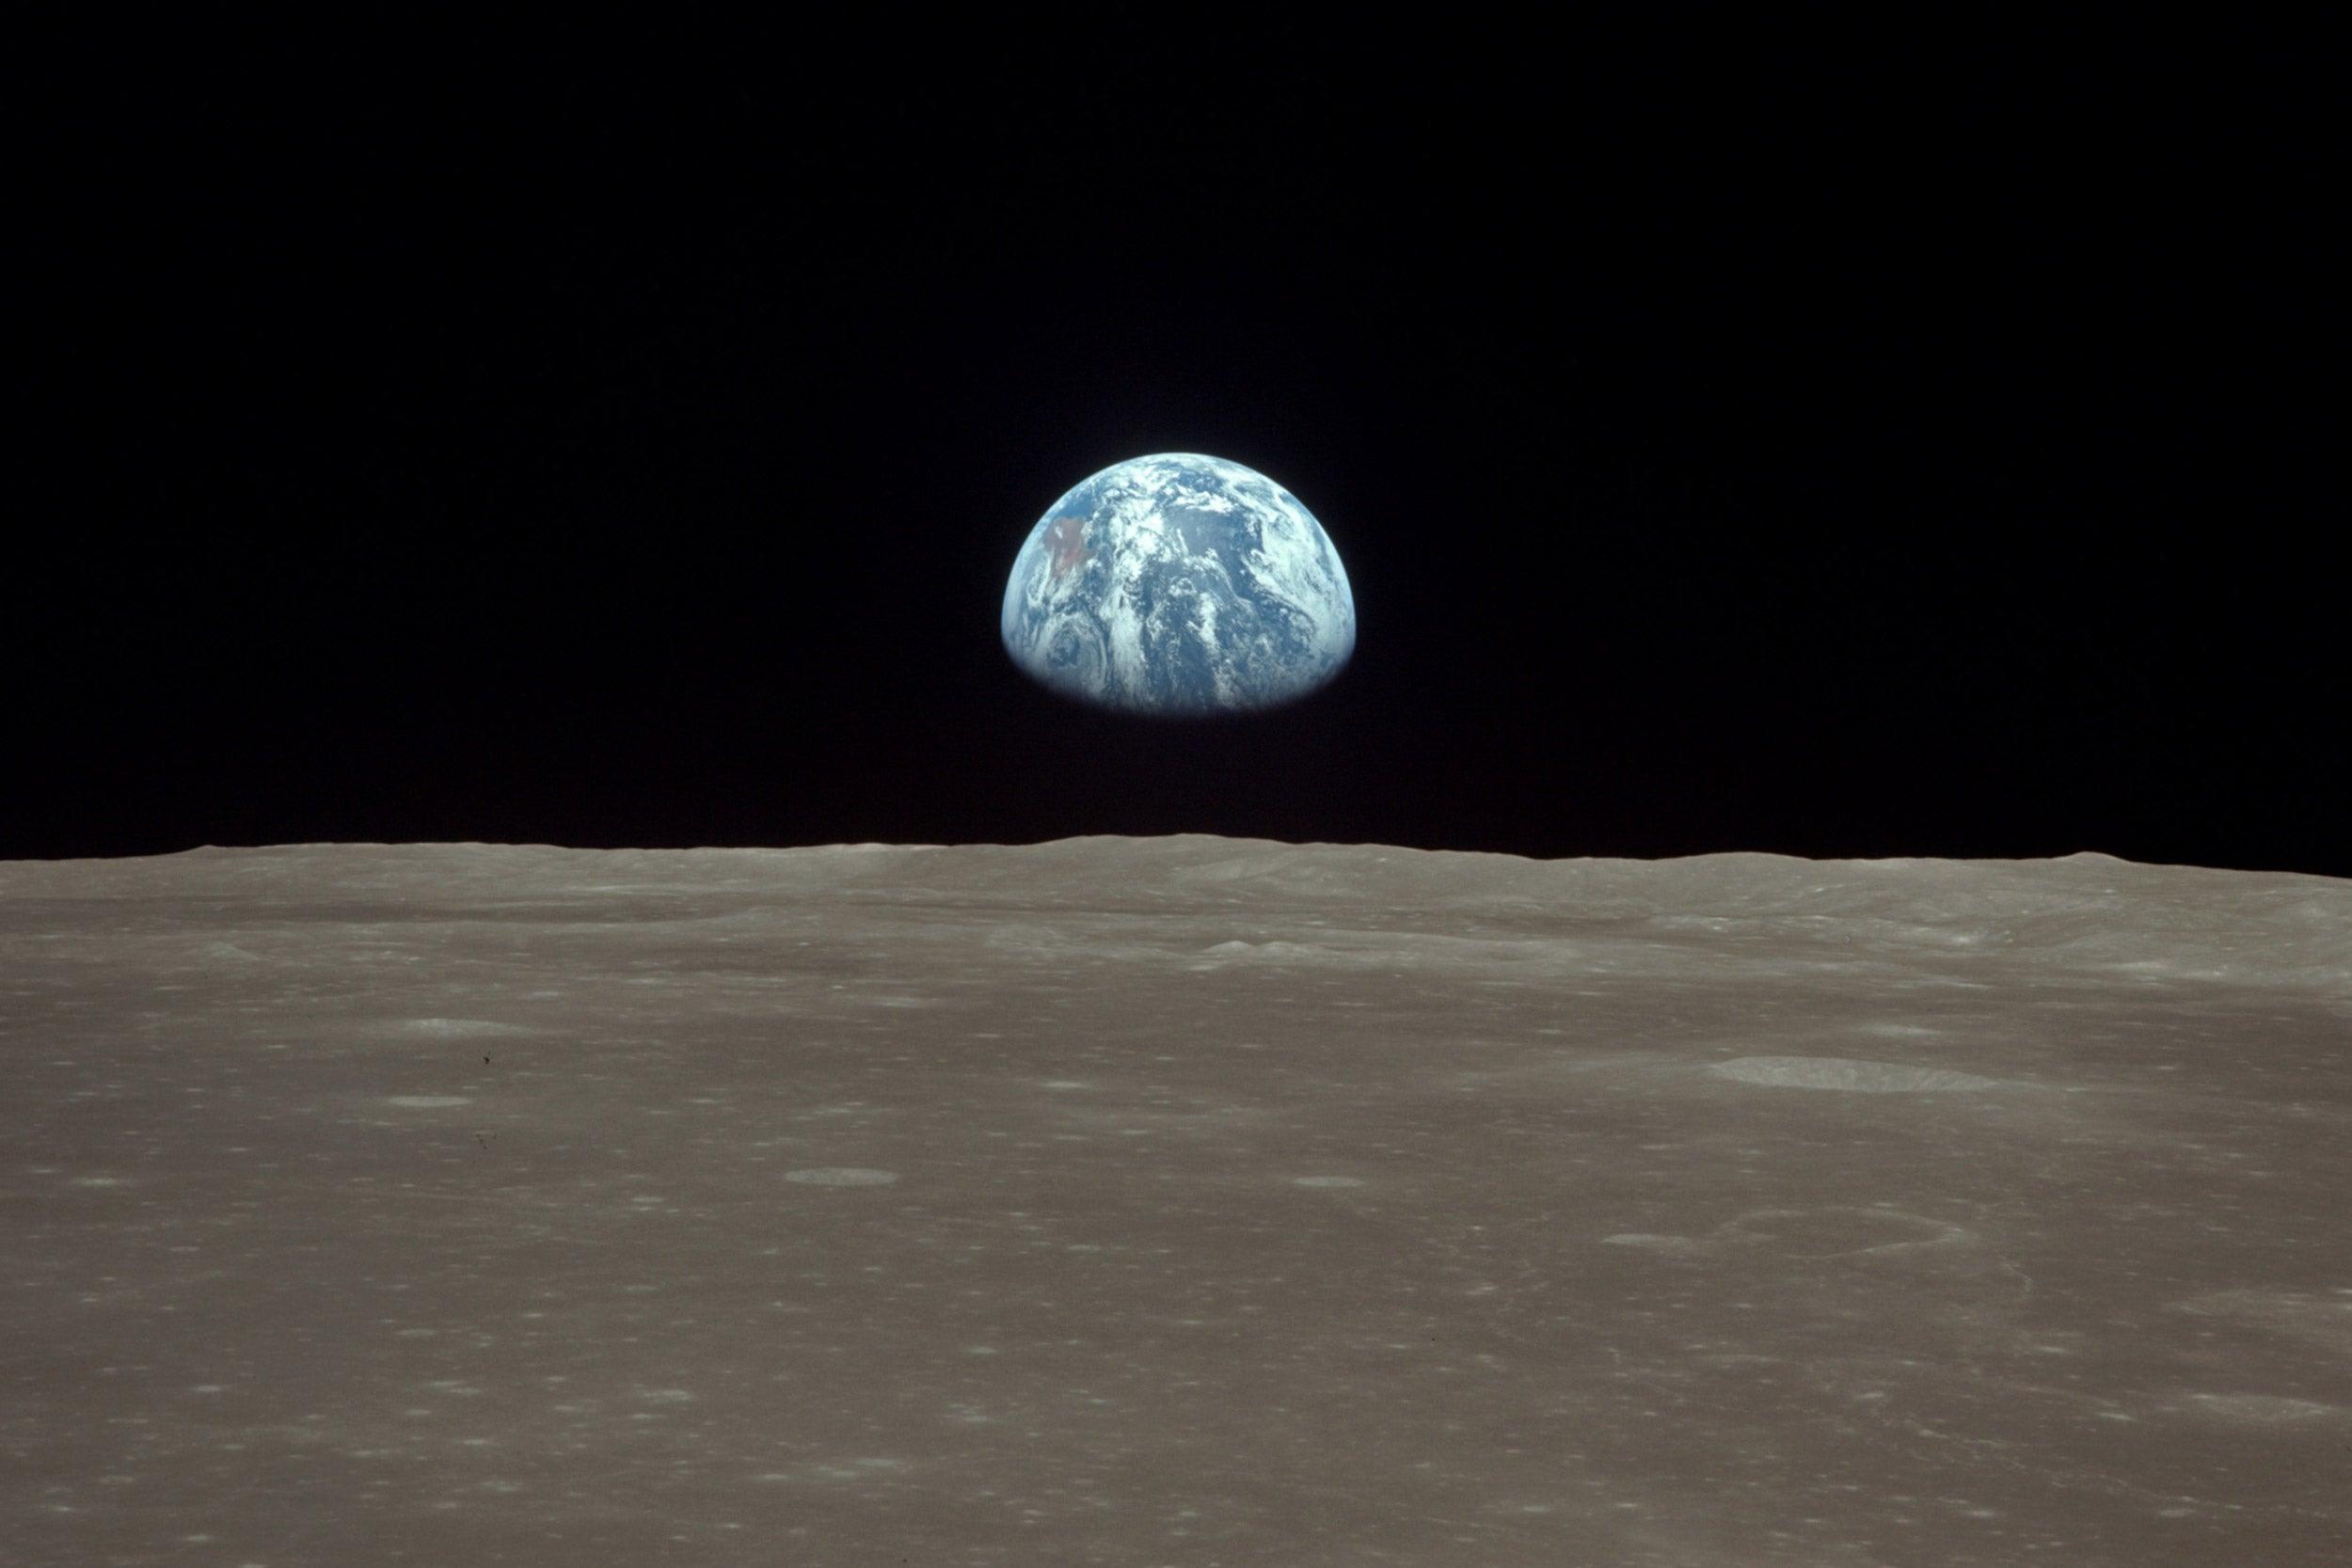 Earthrise viewed from lunar orbit.